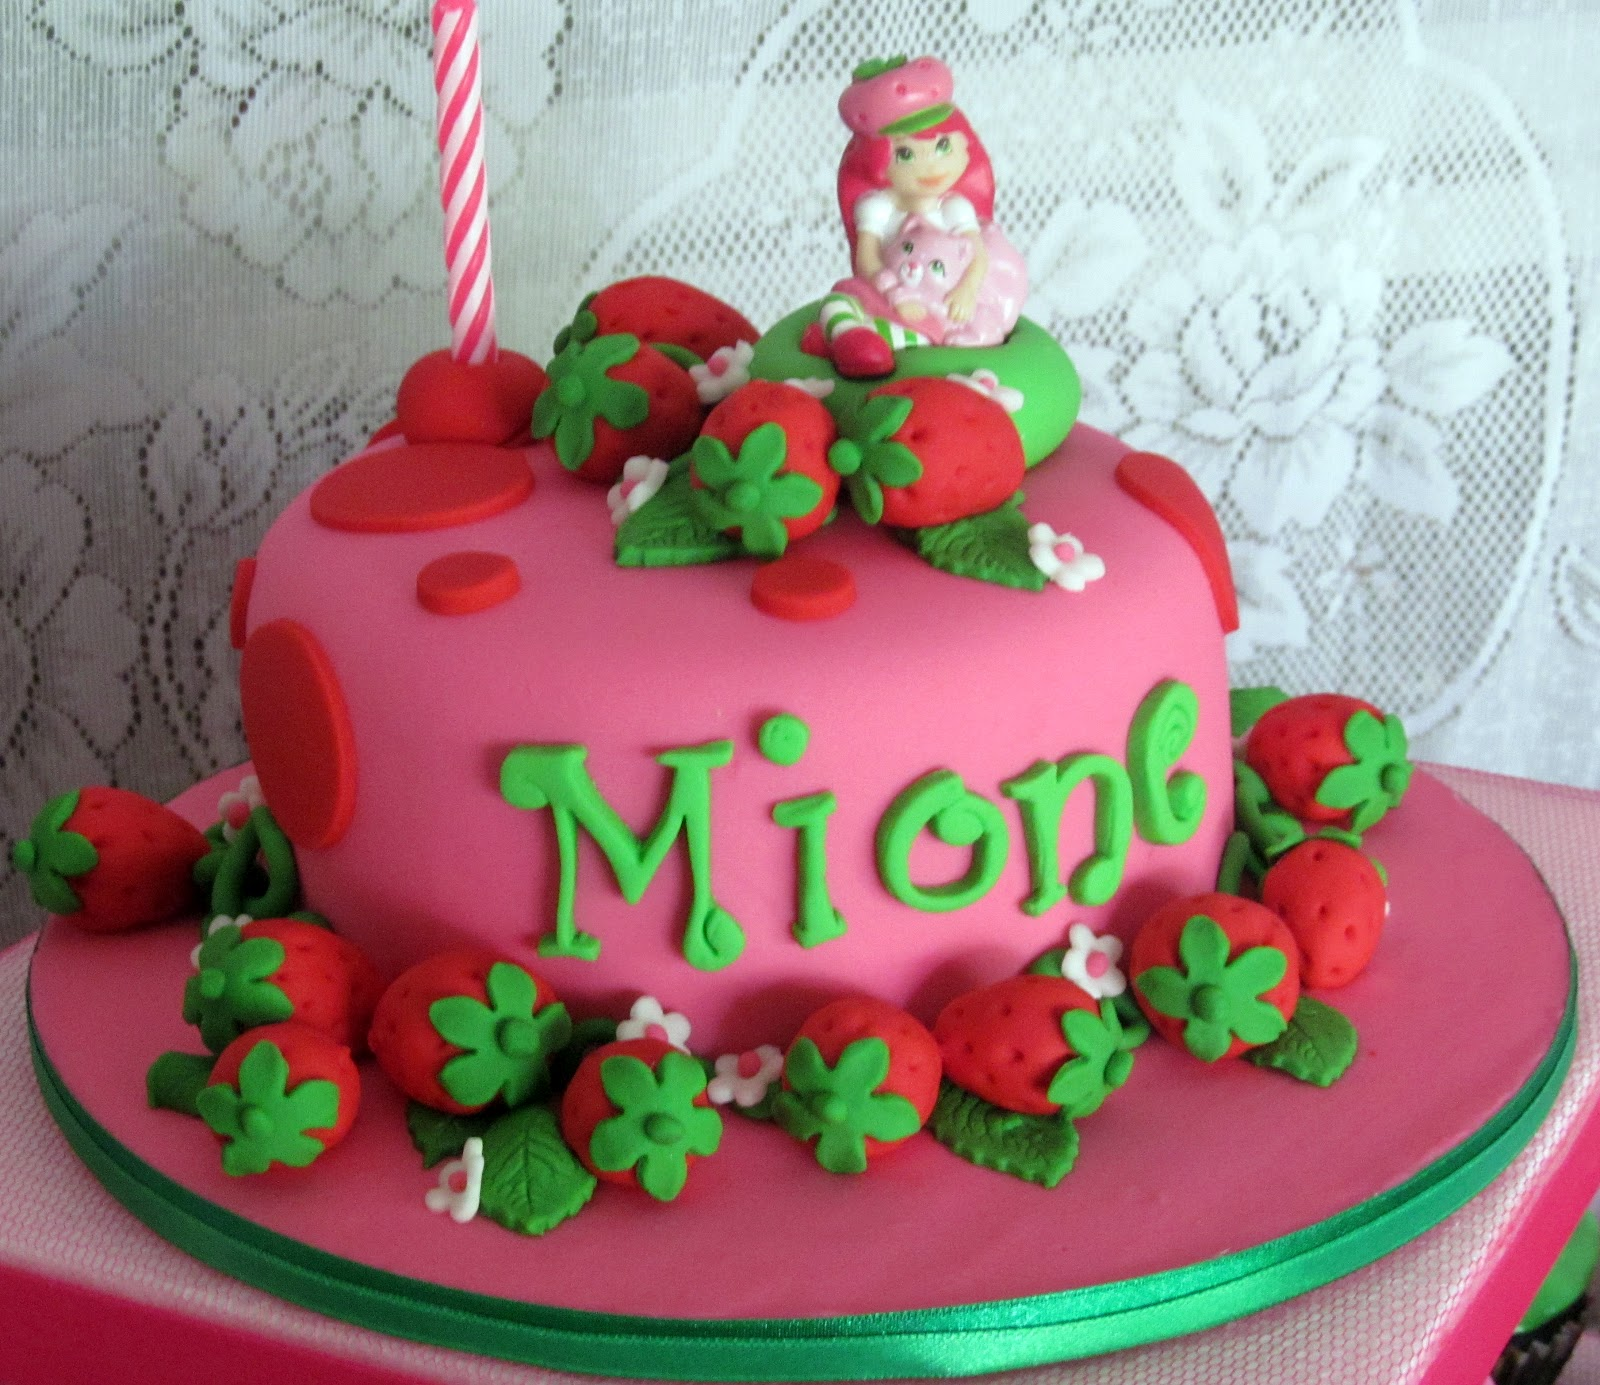 Biba Party Shop: Mione's Strawberry Shortcake Themed Cake II